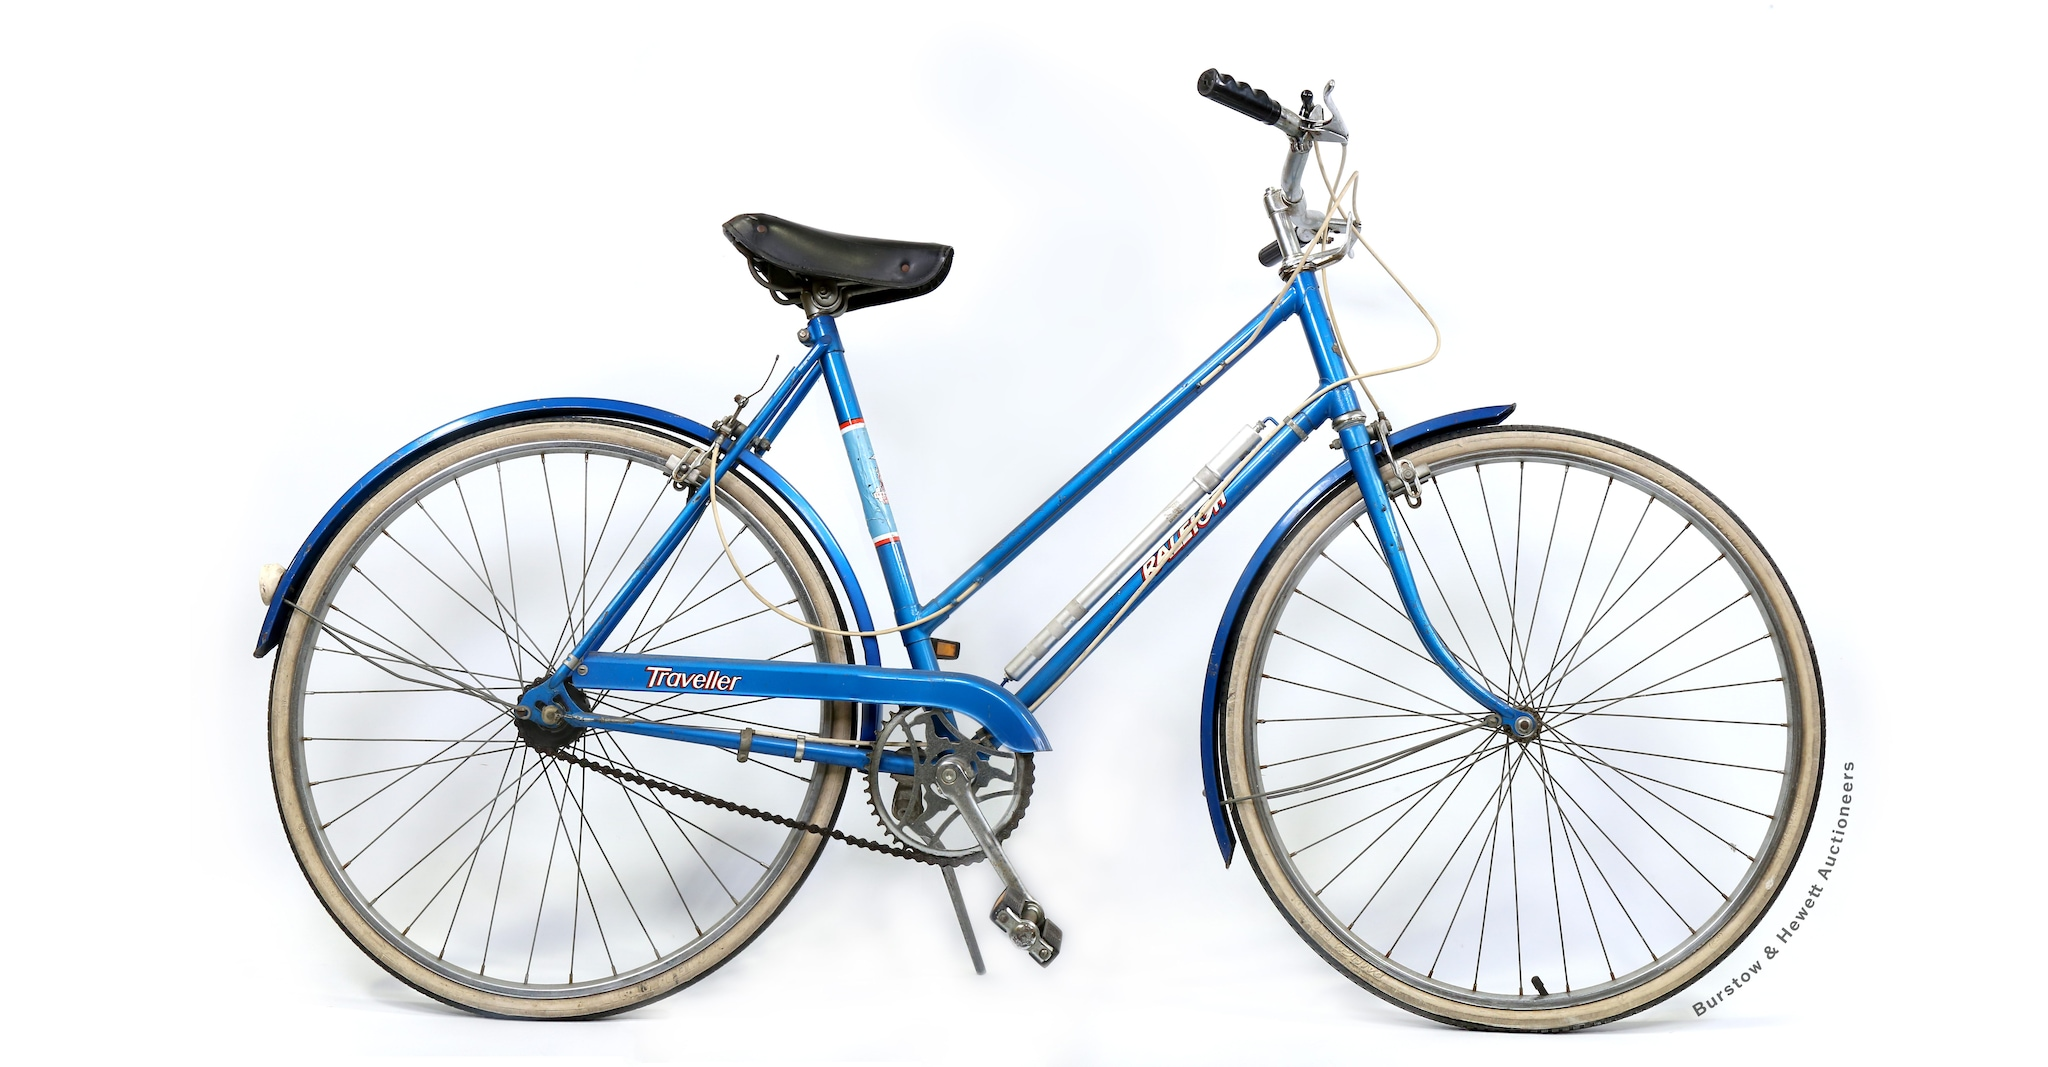 La Raleigh Traveller blu di Lady Diana